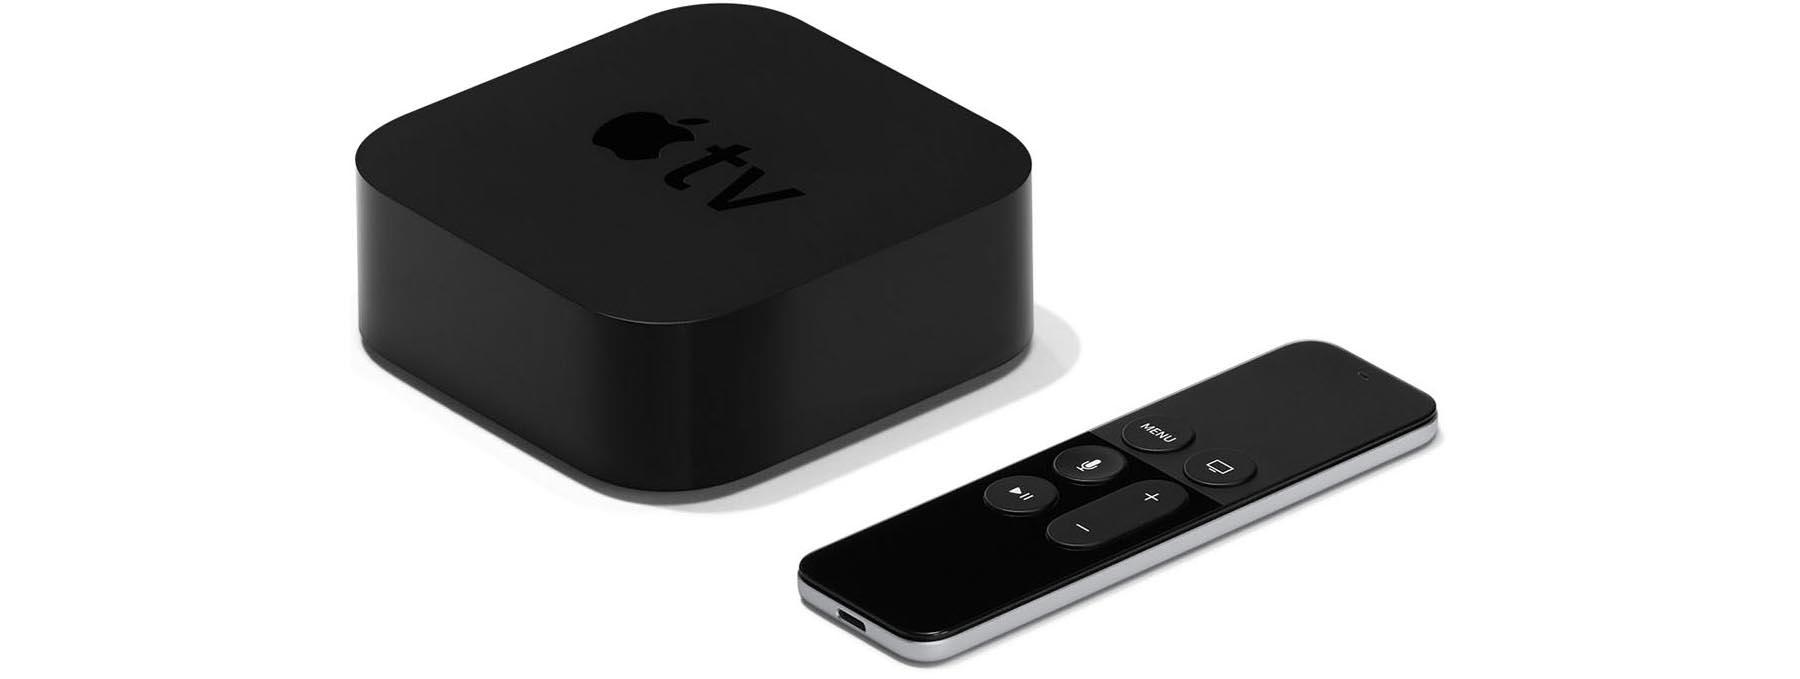 consomac guide d 39 achat apple tv. Black Bedroom Furniture Sets. Home Design Ideas